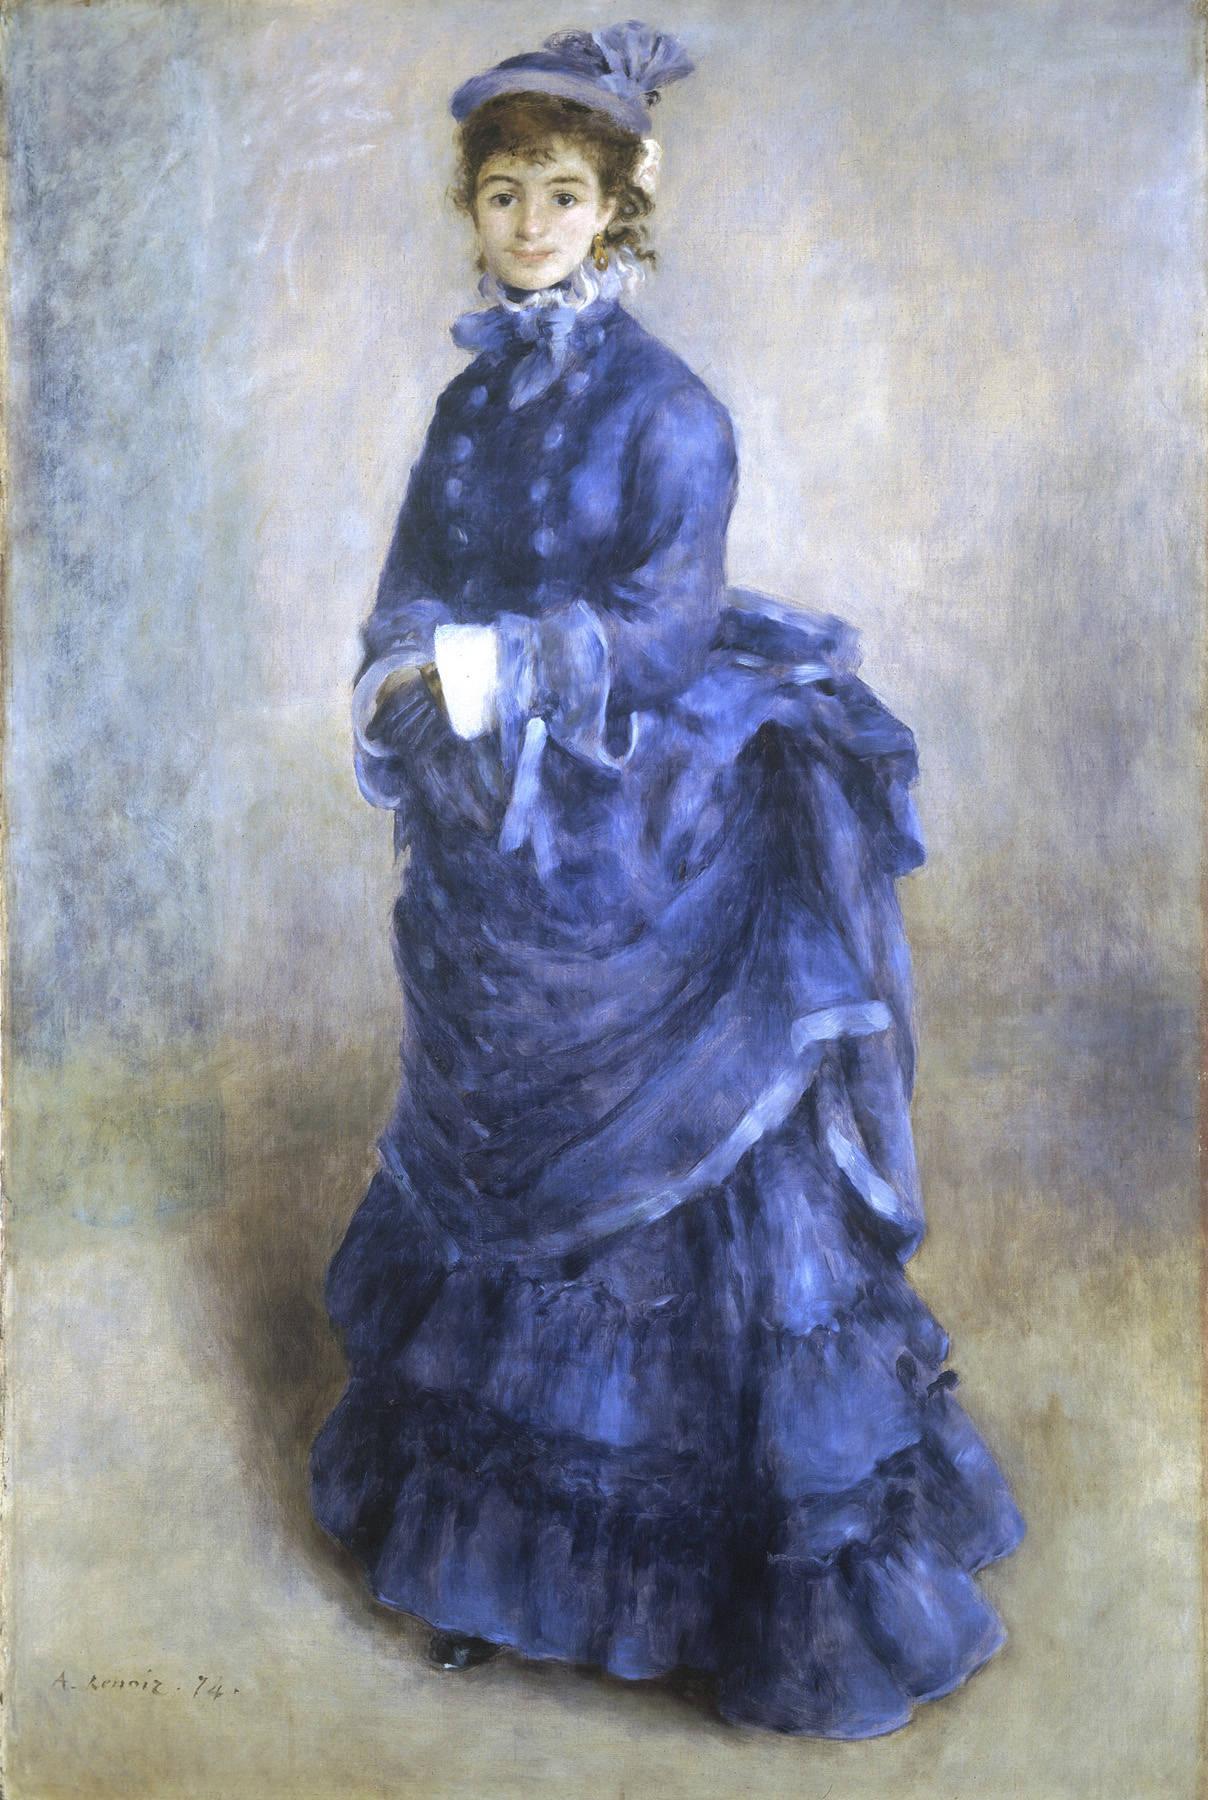 Renoir's Depection of Women in 19th Century Art